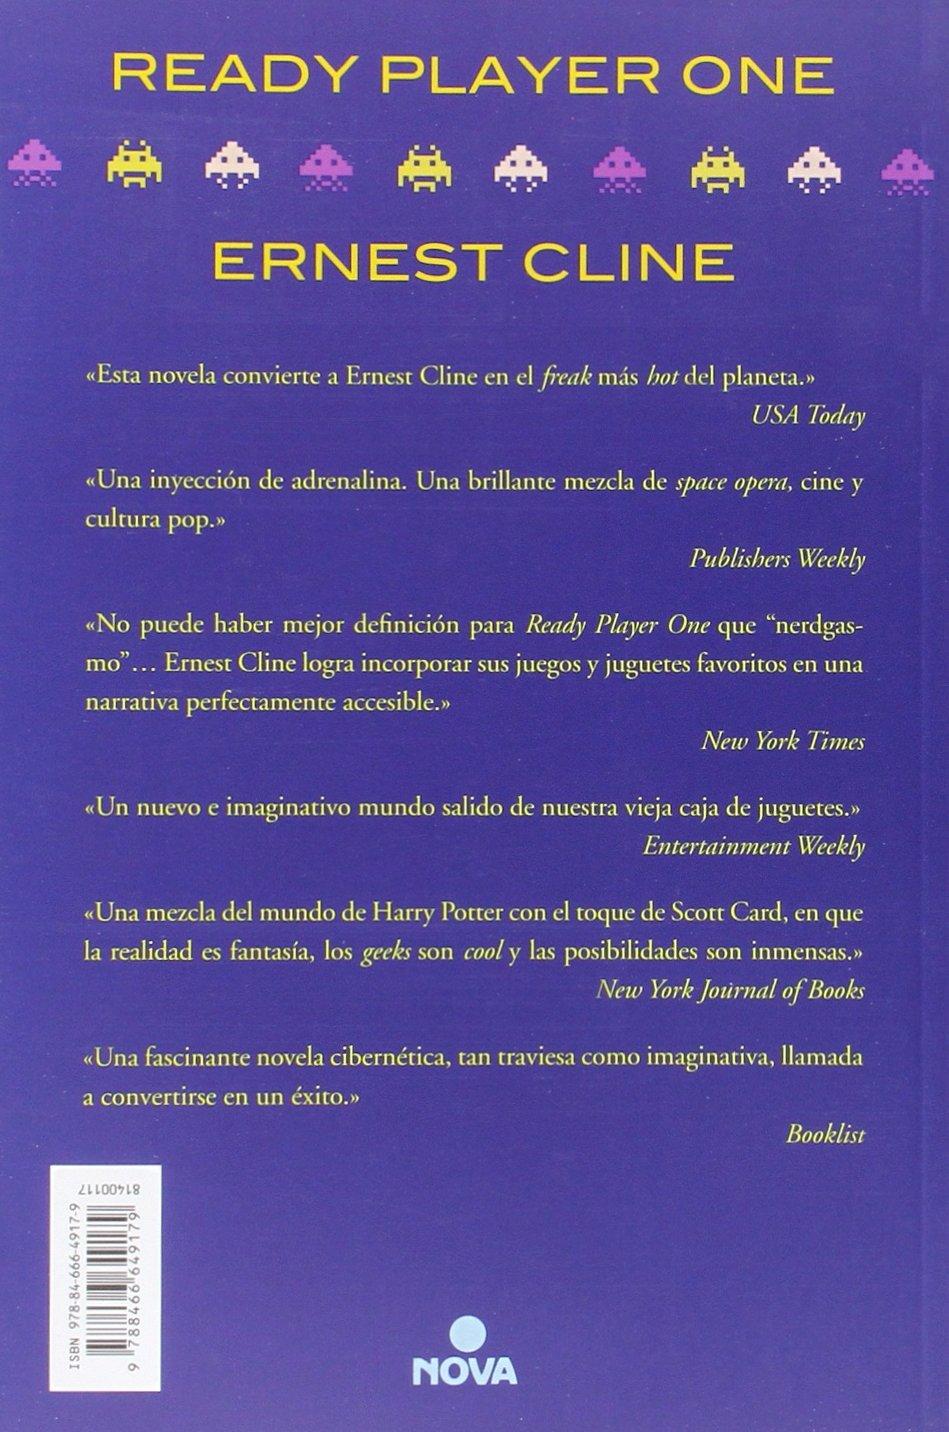 Ready player one (Grandes novelas): Amazon.es: Cline, Ernest: Libros